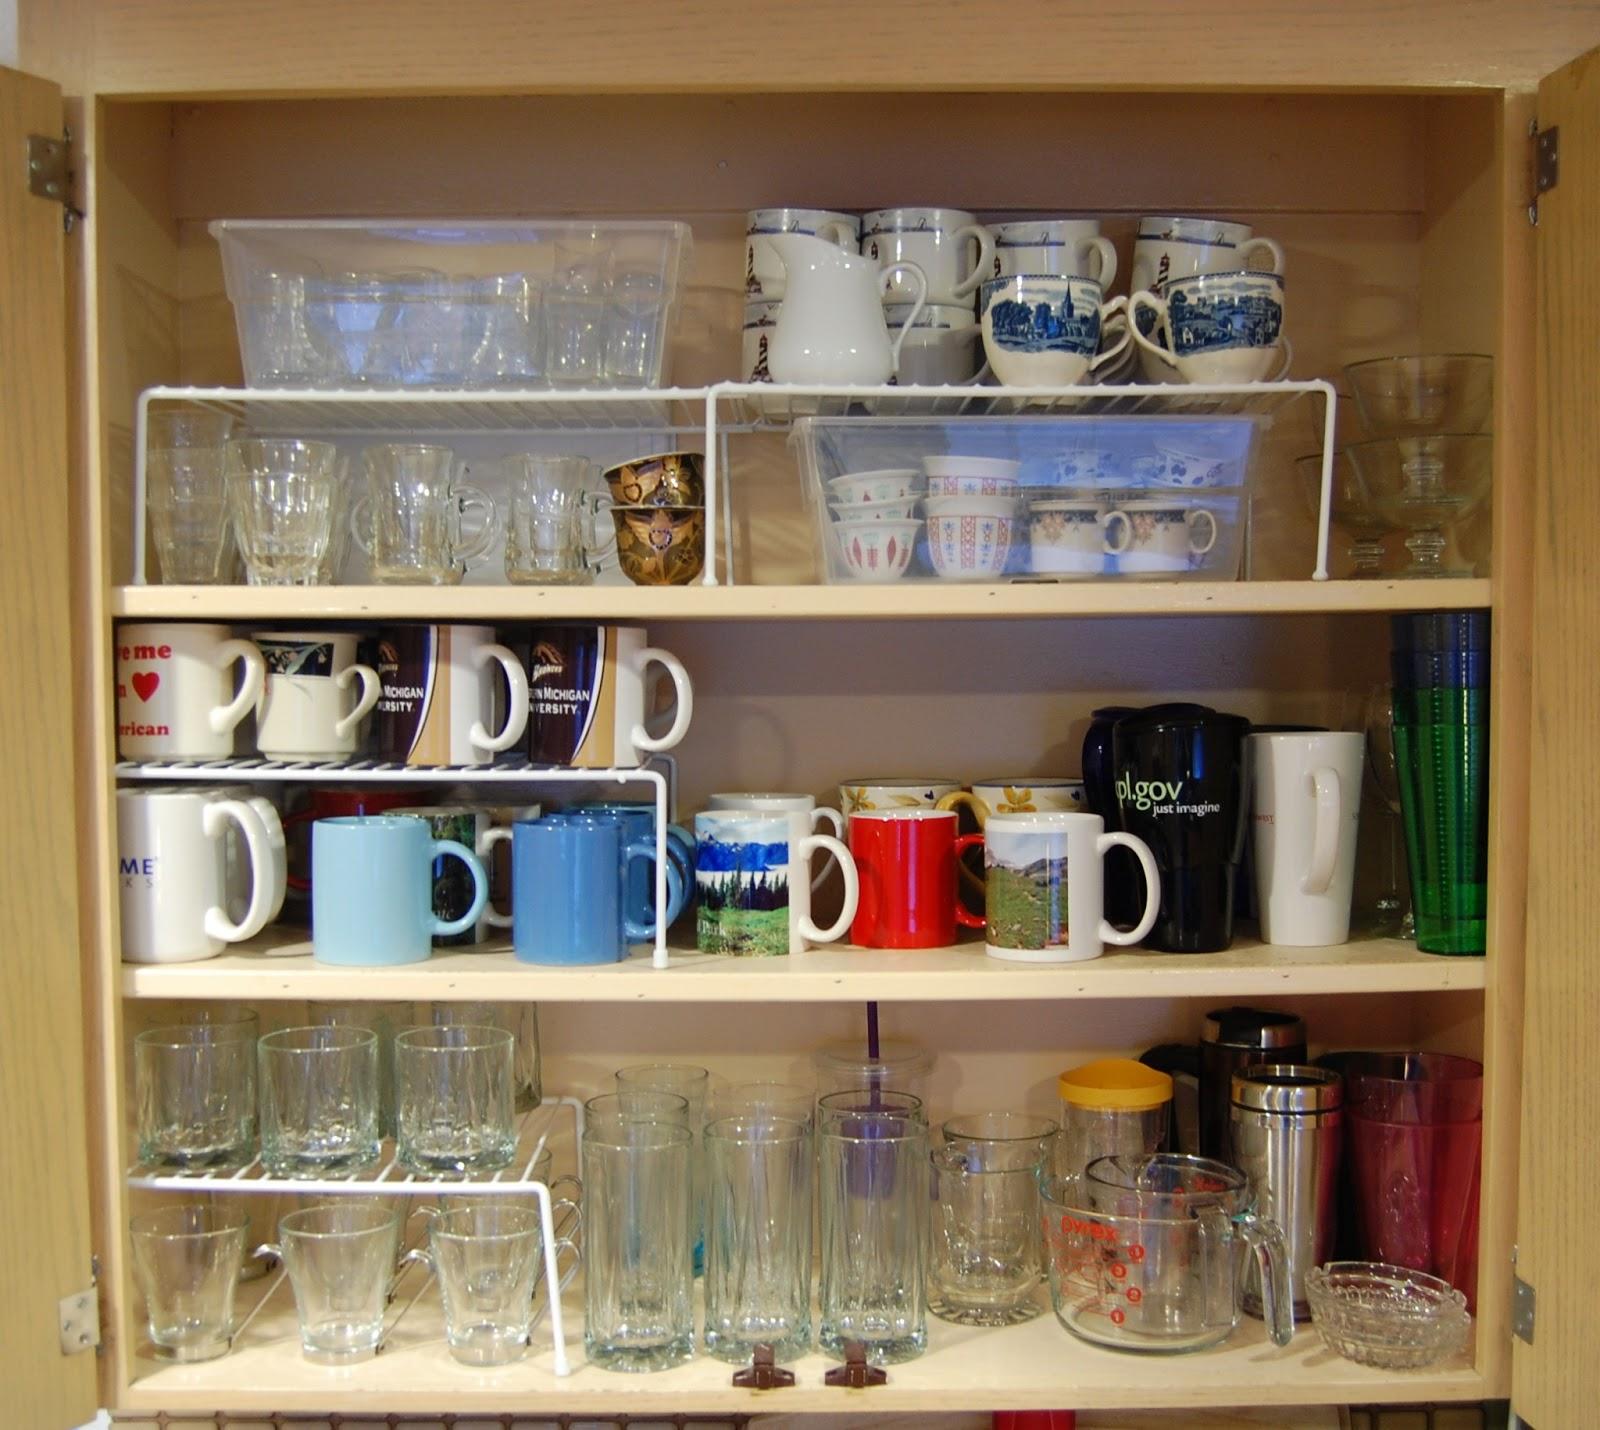 How To Organize Your Kitchen Cabinets: Miscellanea Etcetera: Kitchen Organization Part 3: Glassware